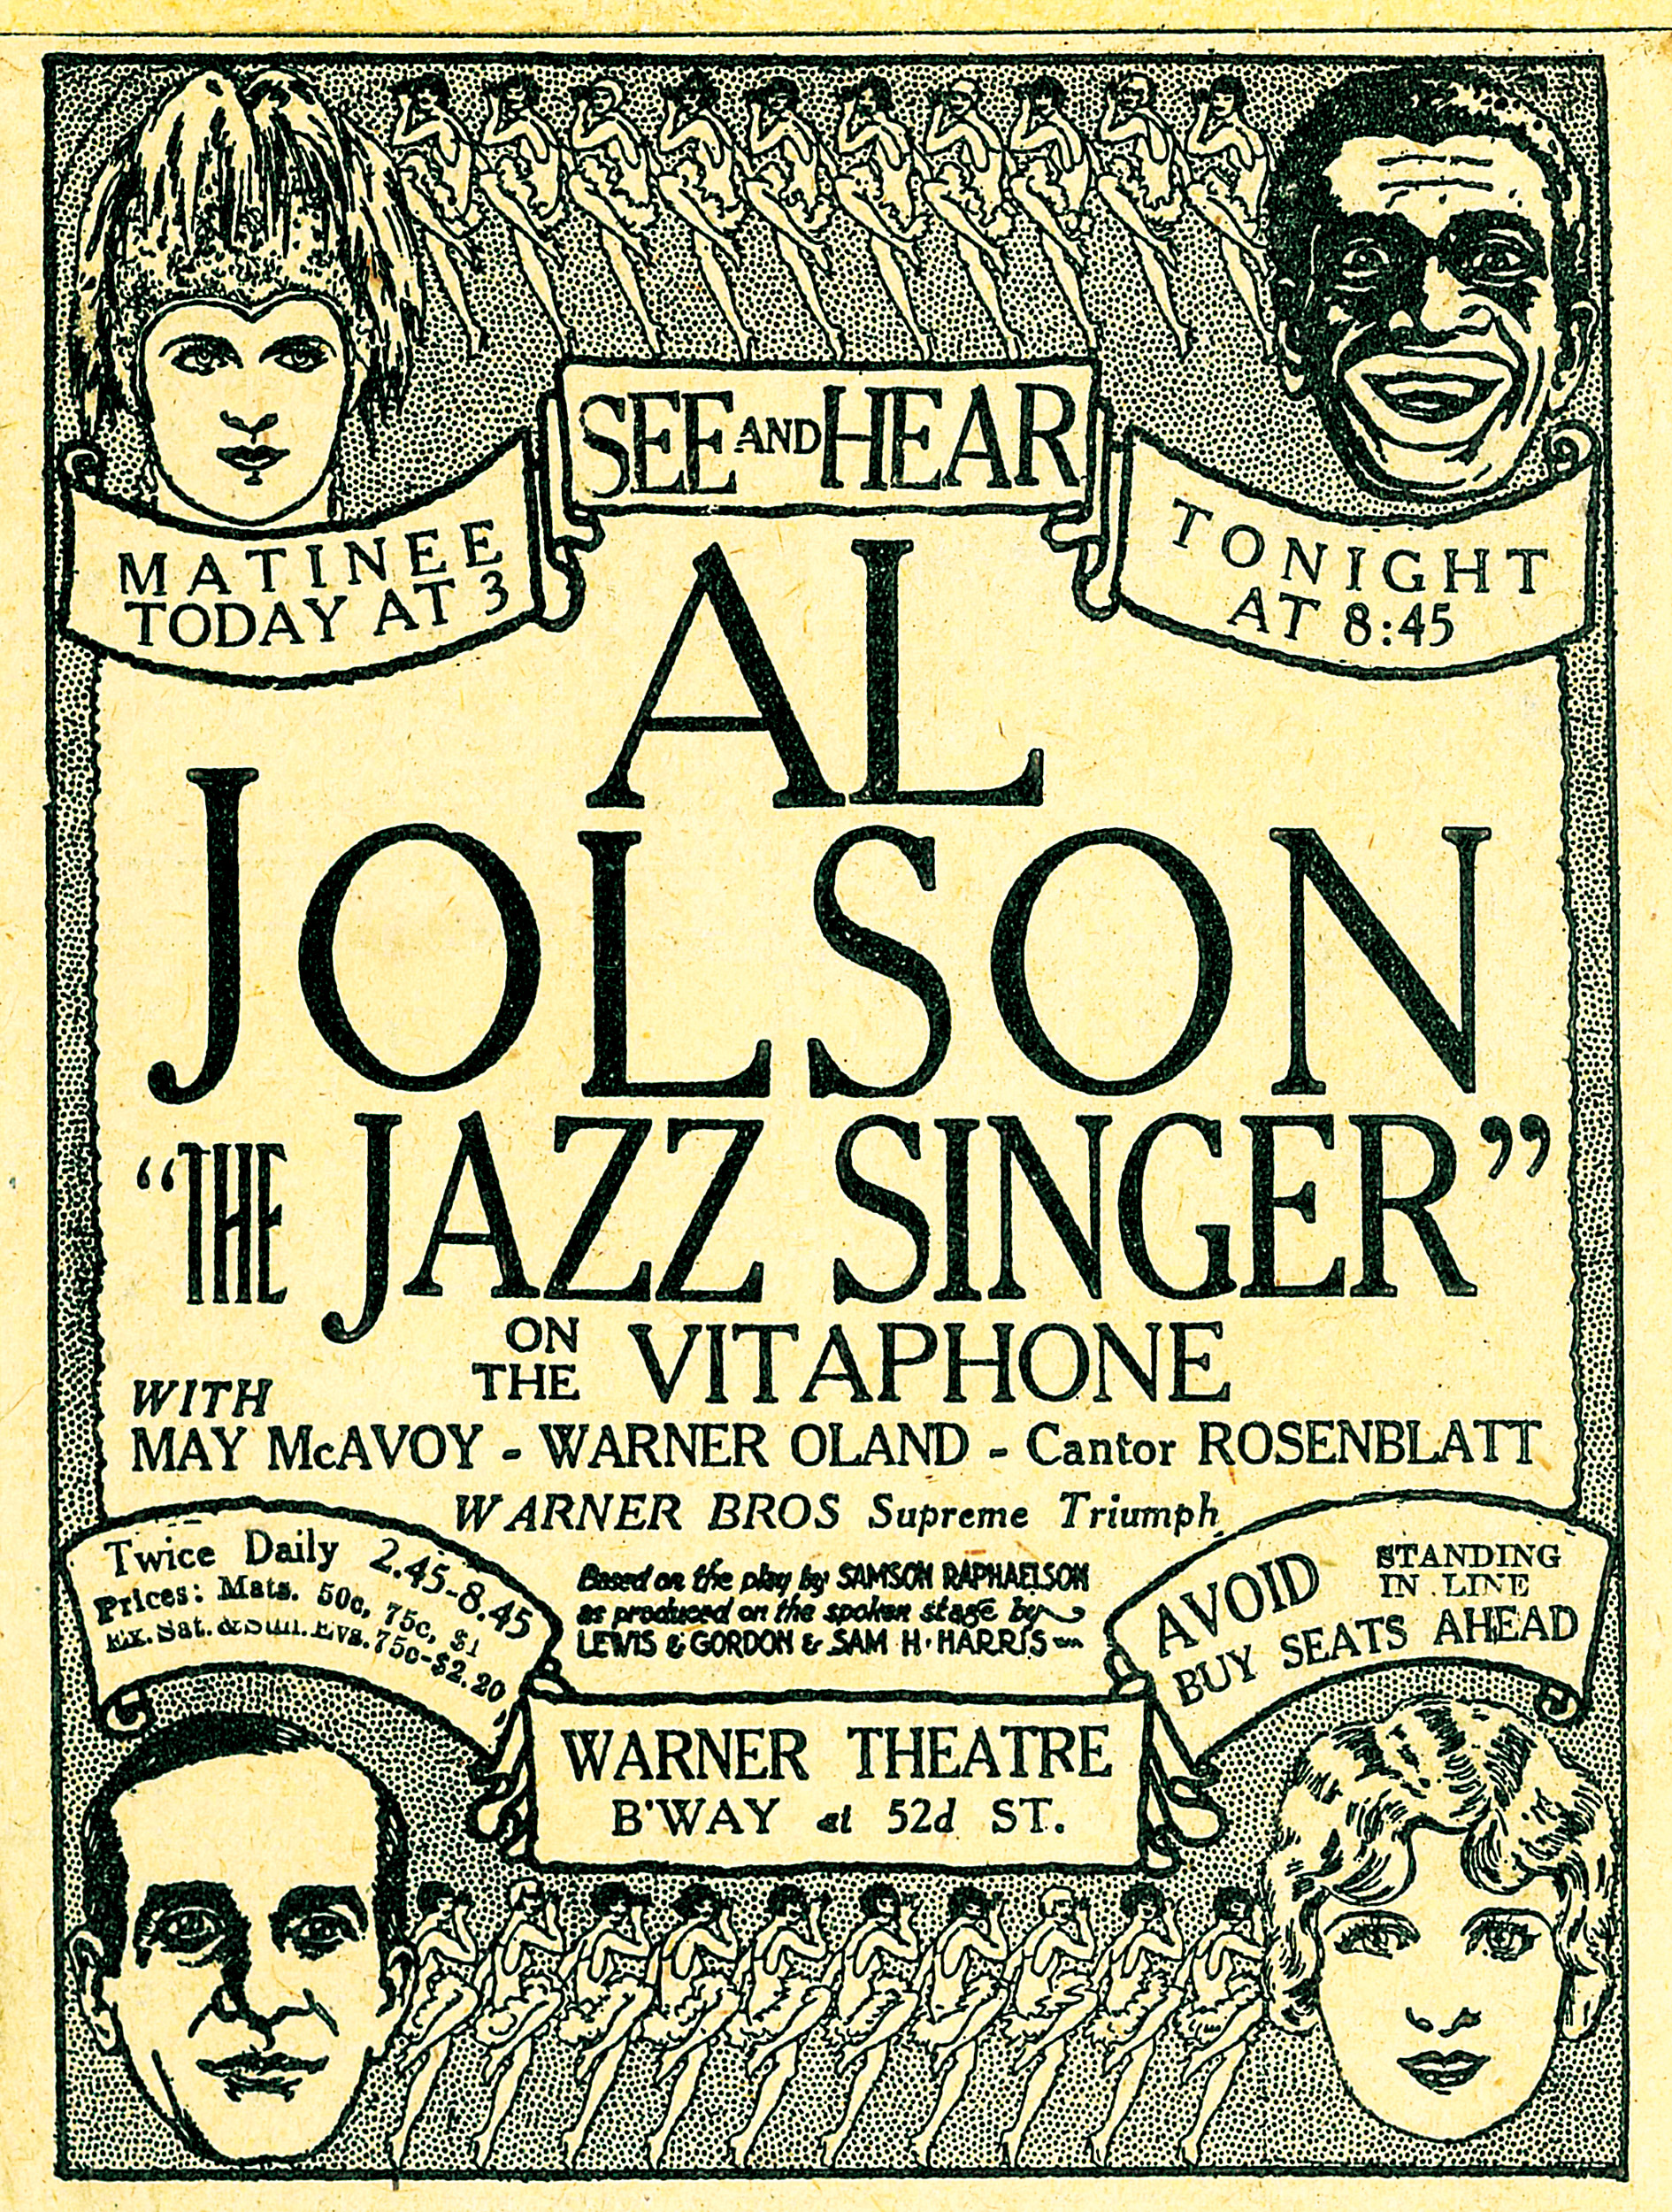 The Jazz Singer  newspaper advertisement, 1927.